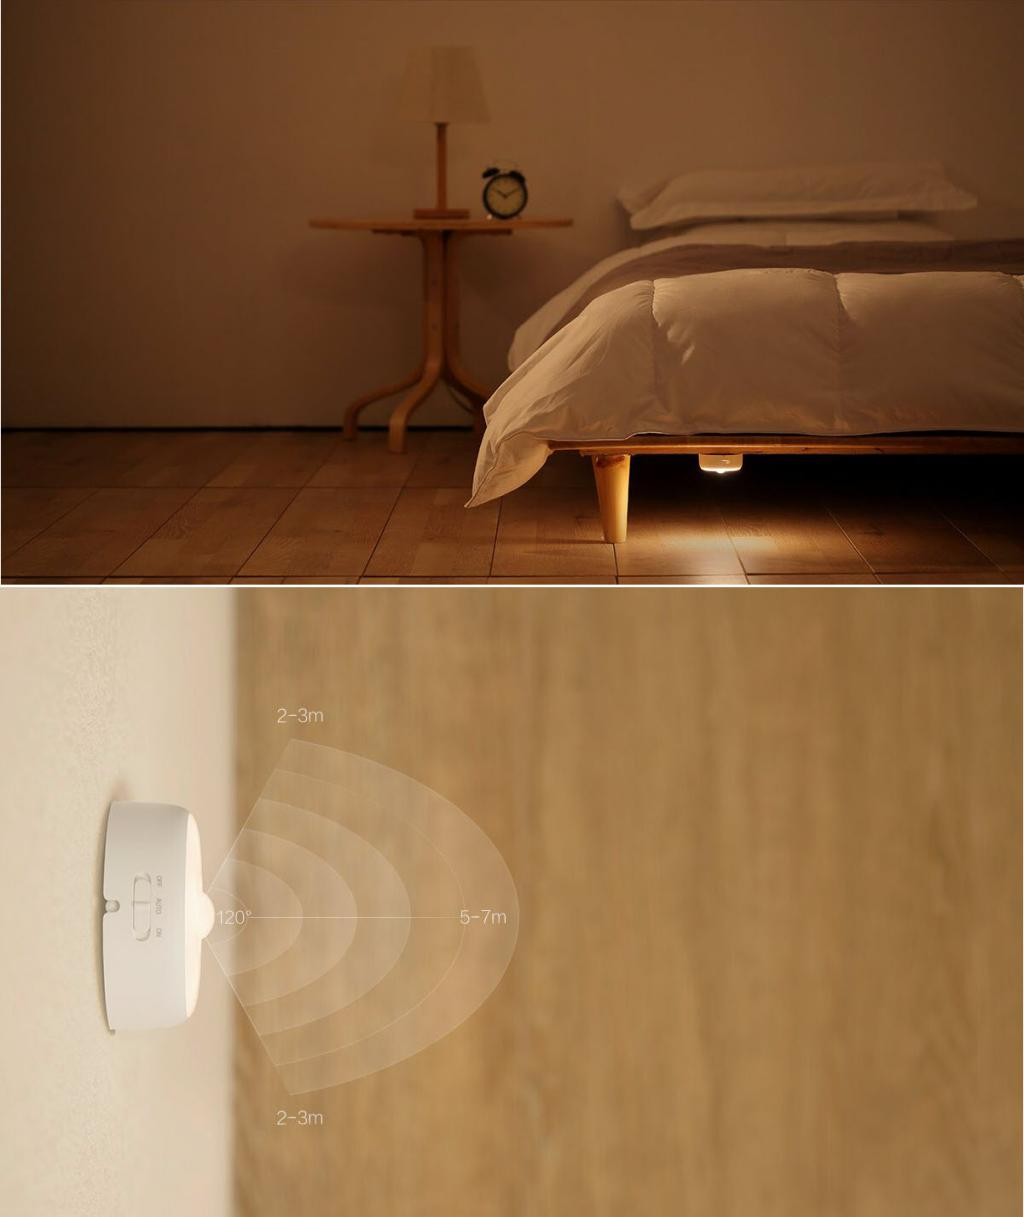 Yeelight Motion Sensor Rechargeable Nightlight (5)